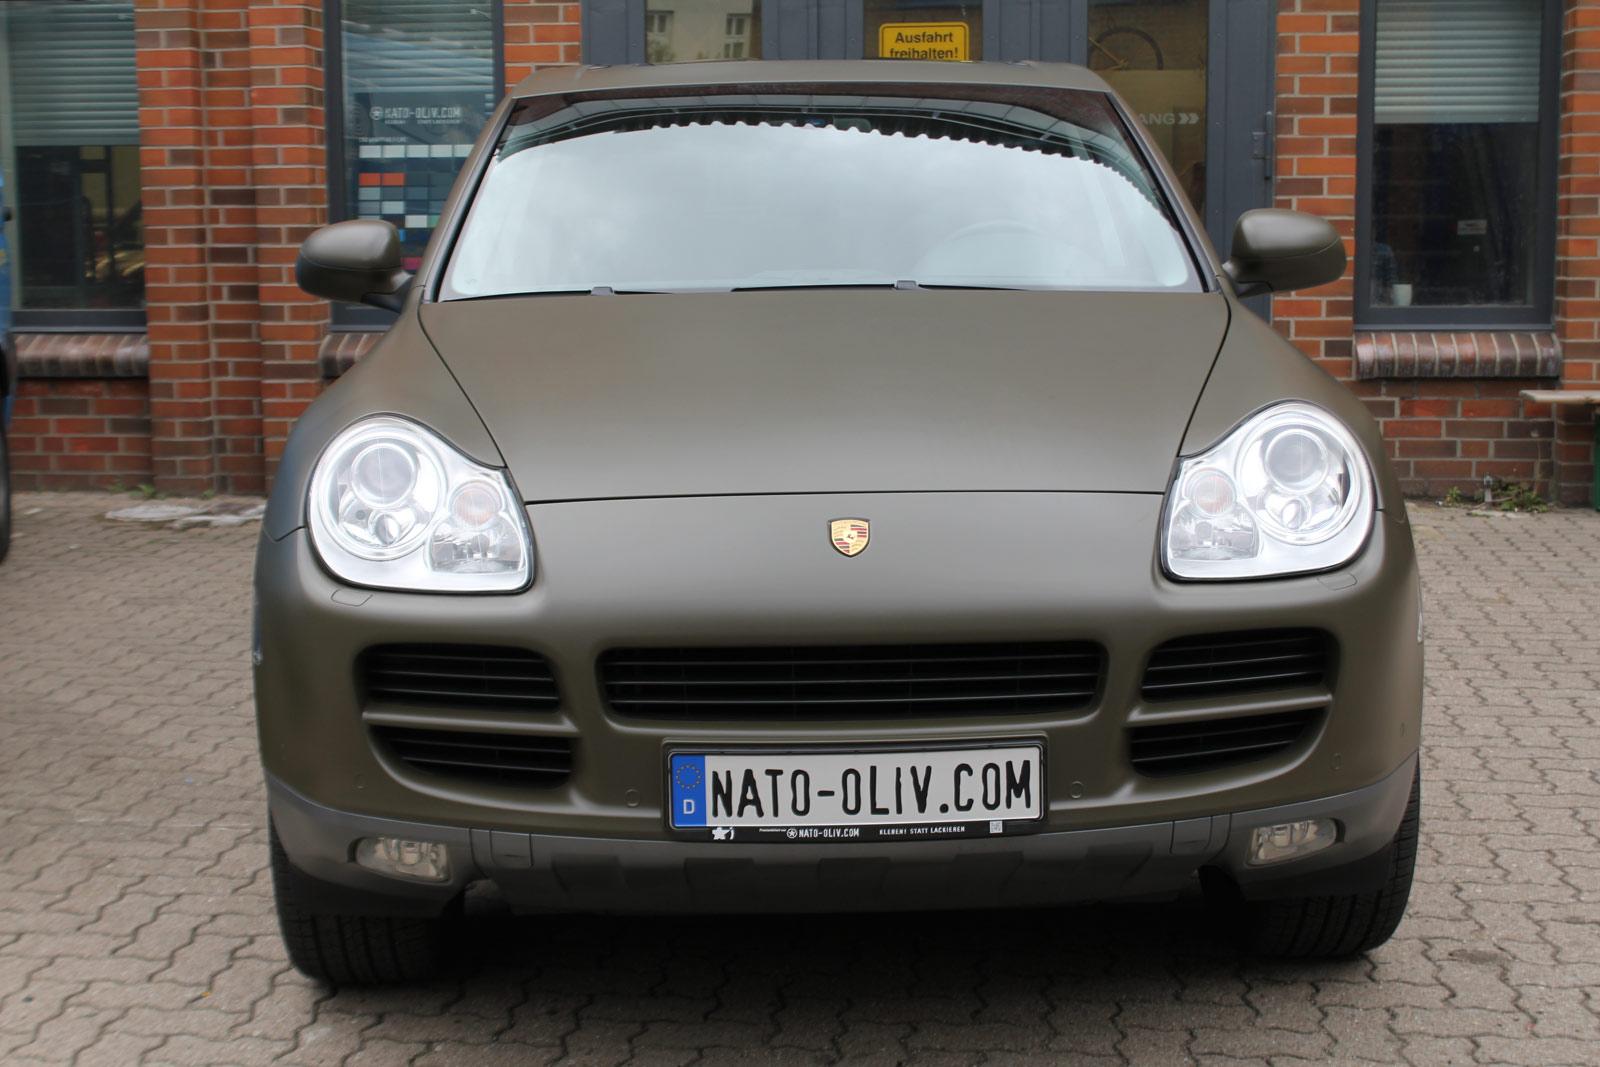 Porsche_Cayenne_Folierung_Nato-Oliv_Matt_11